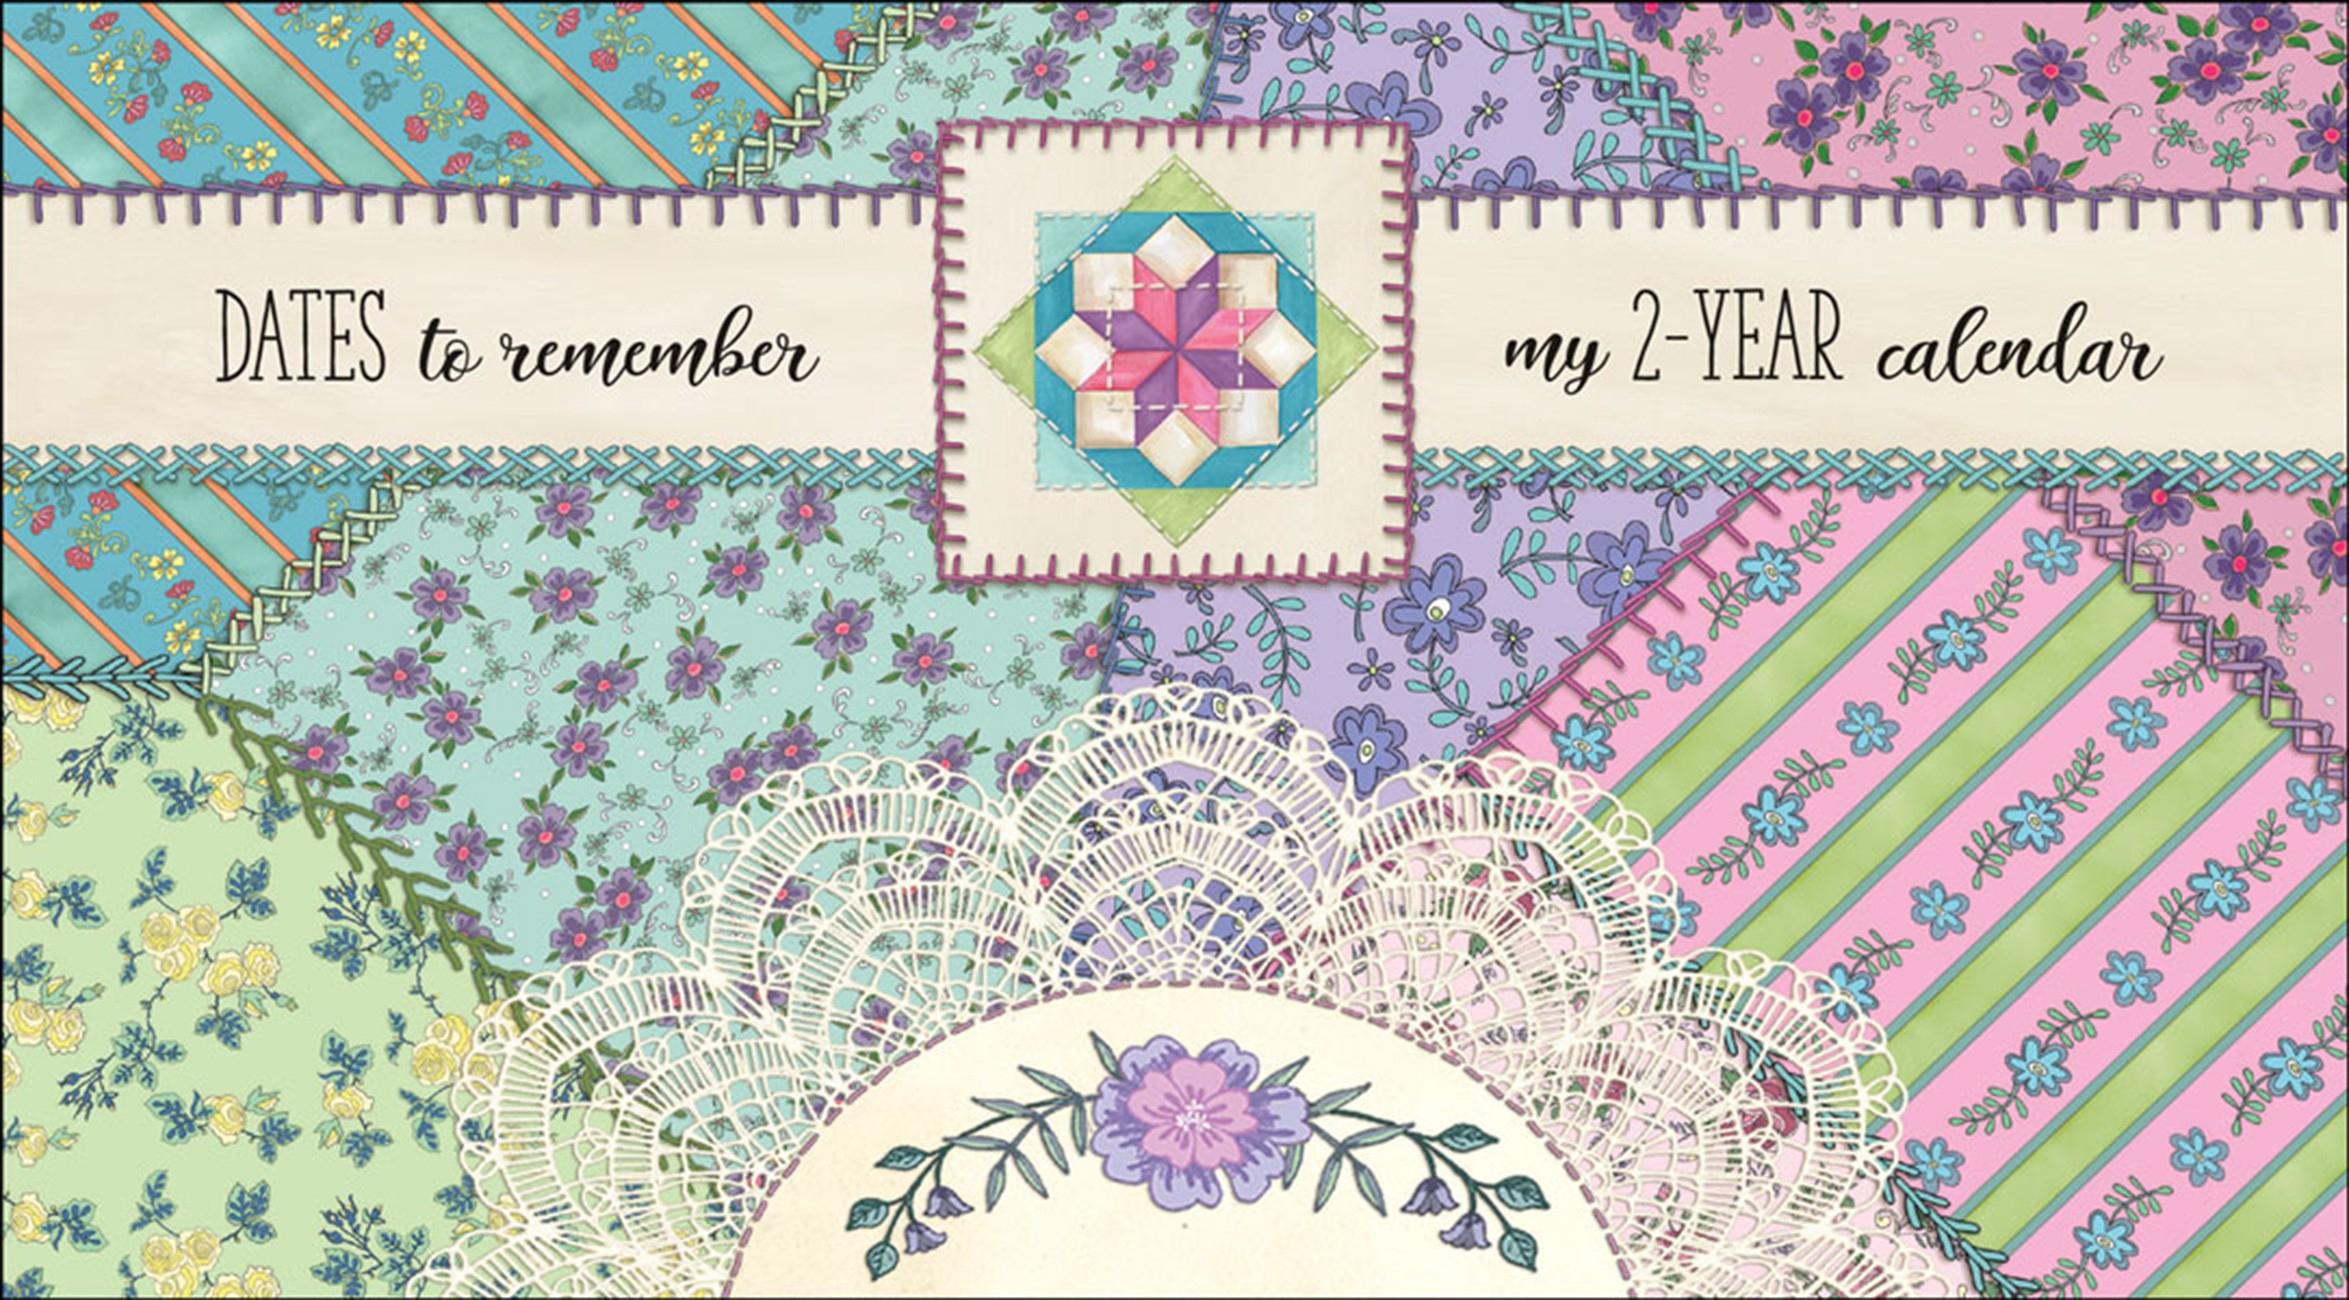 Nancy Mink Crazy Quilt 2 Year Pocket Calendar 2021/2022